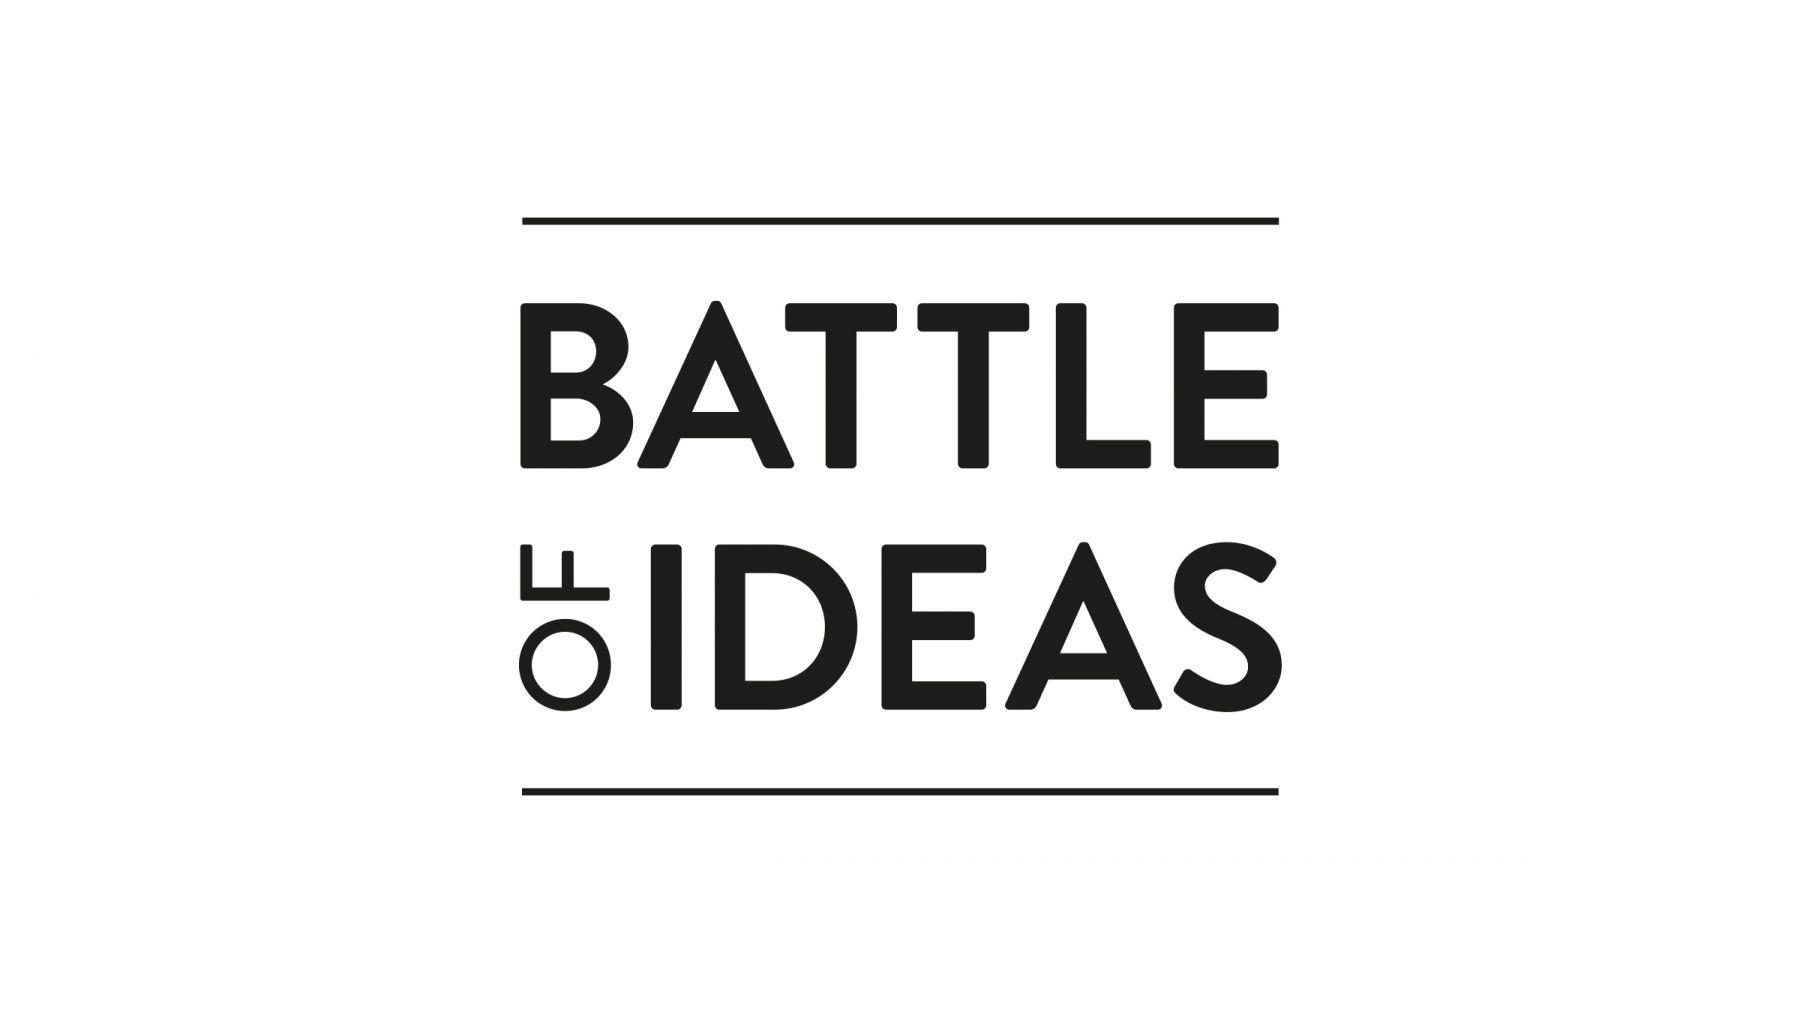 Battle of Ideas logo design